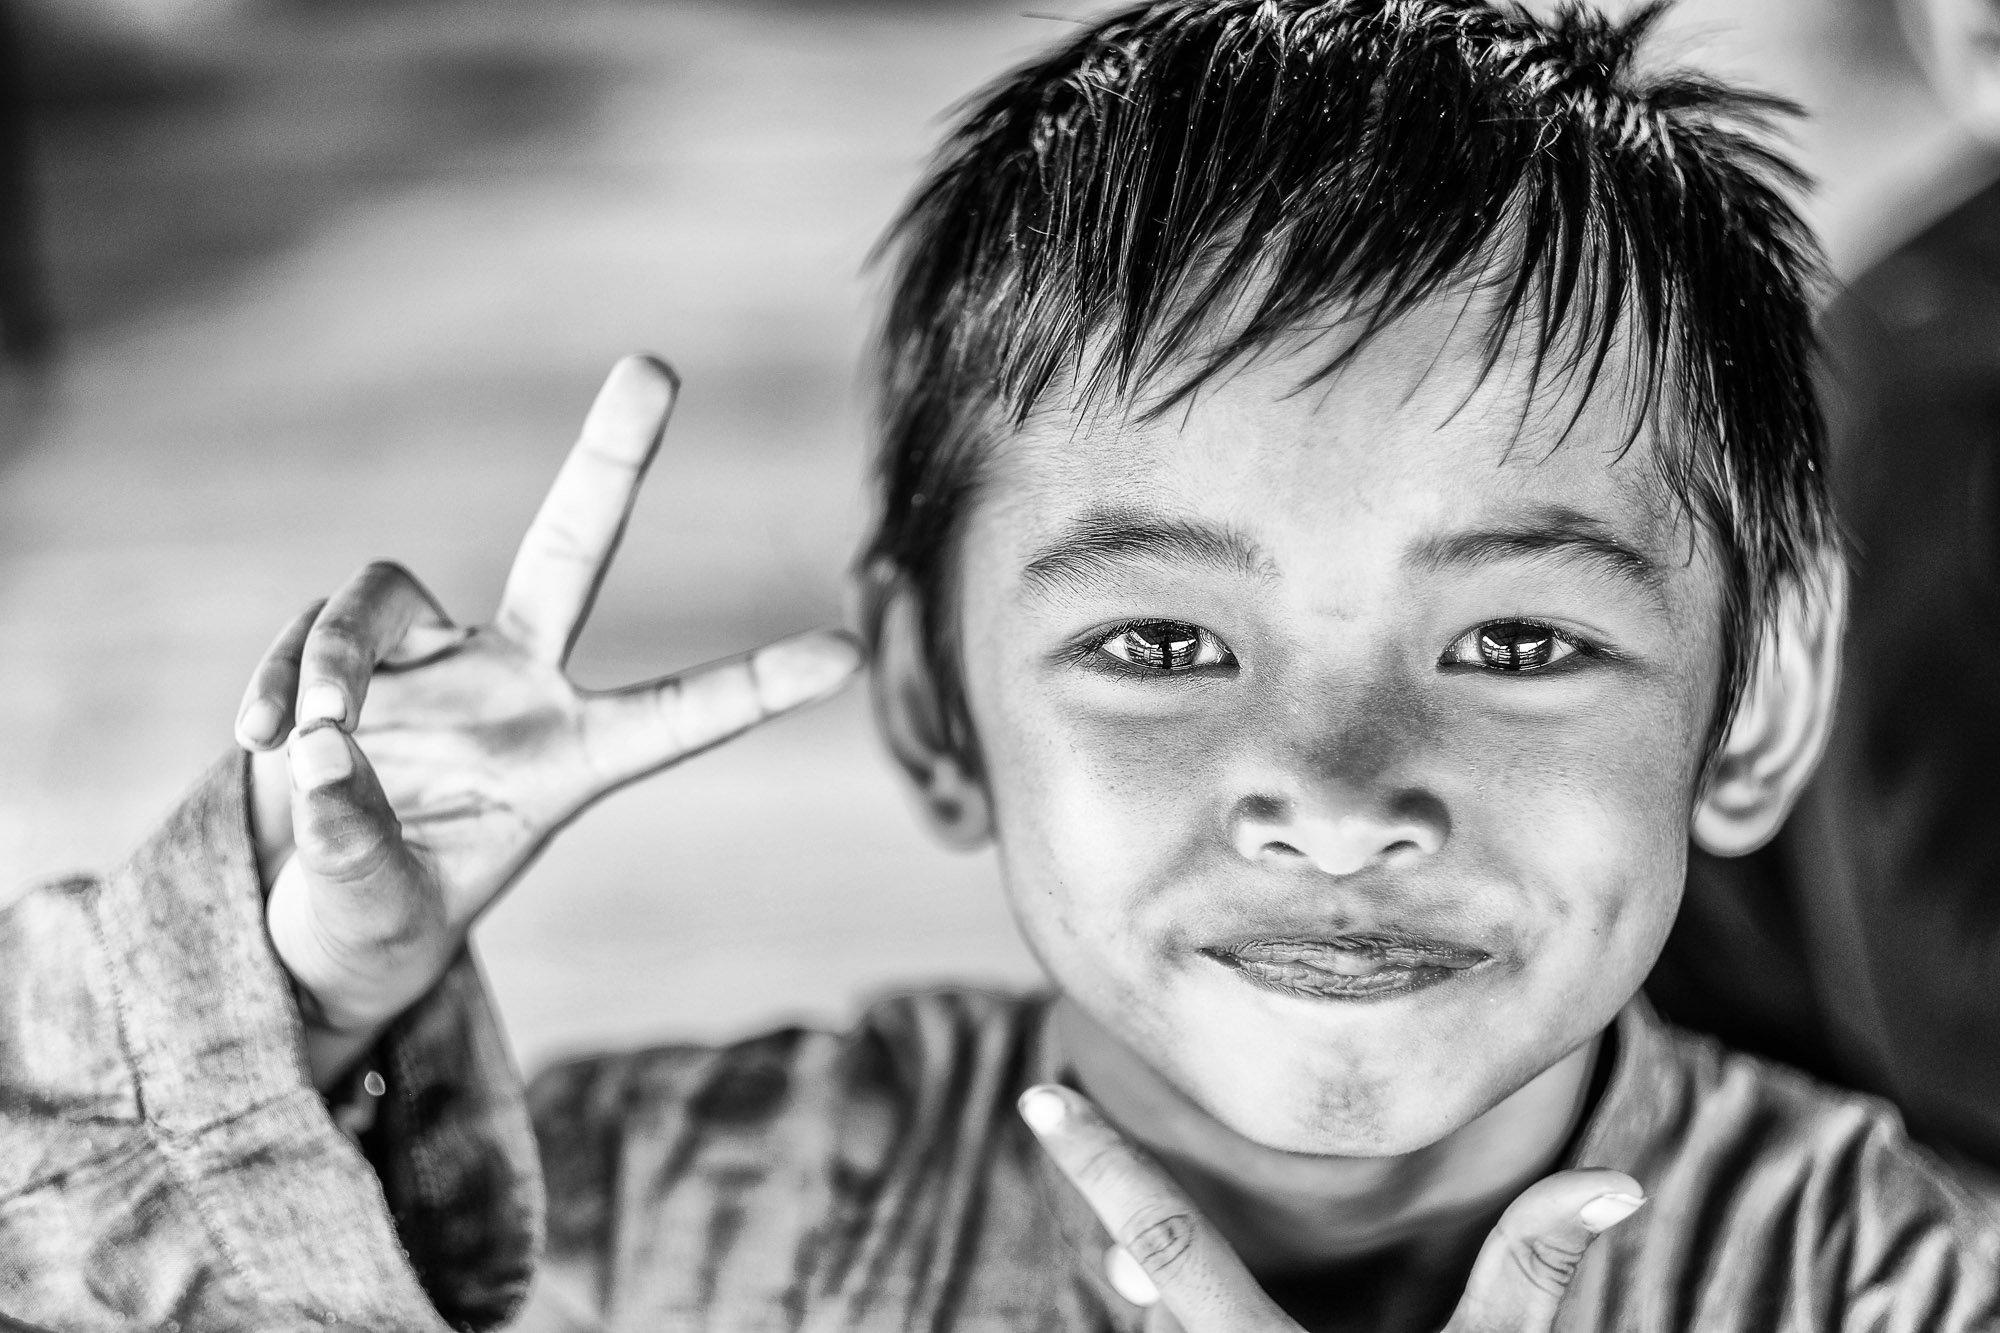 BRUNEI borneo street photography kid boy